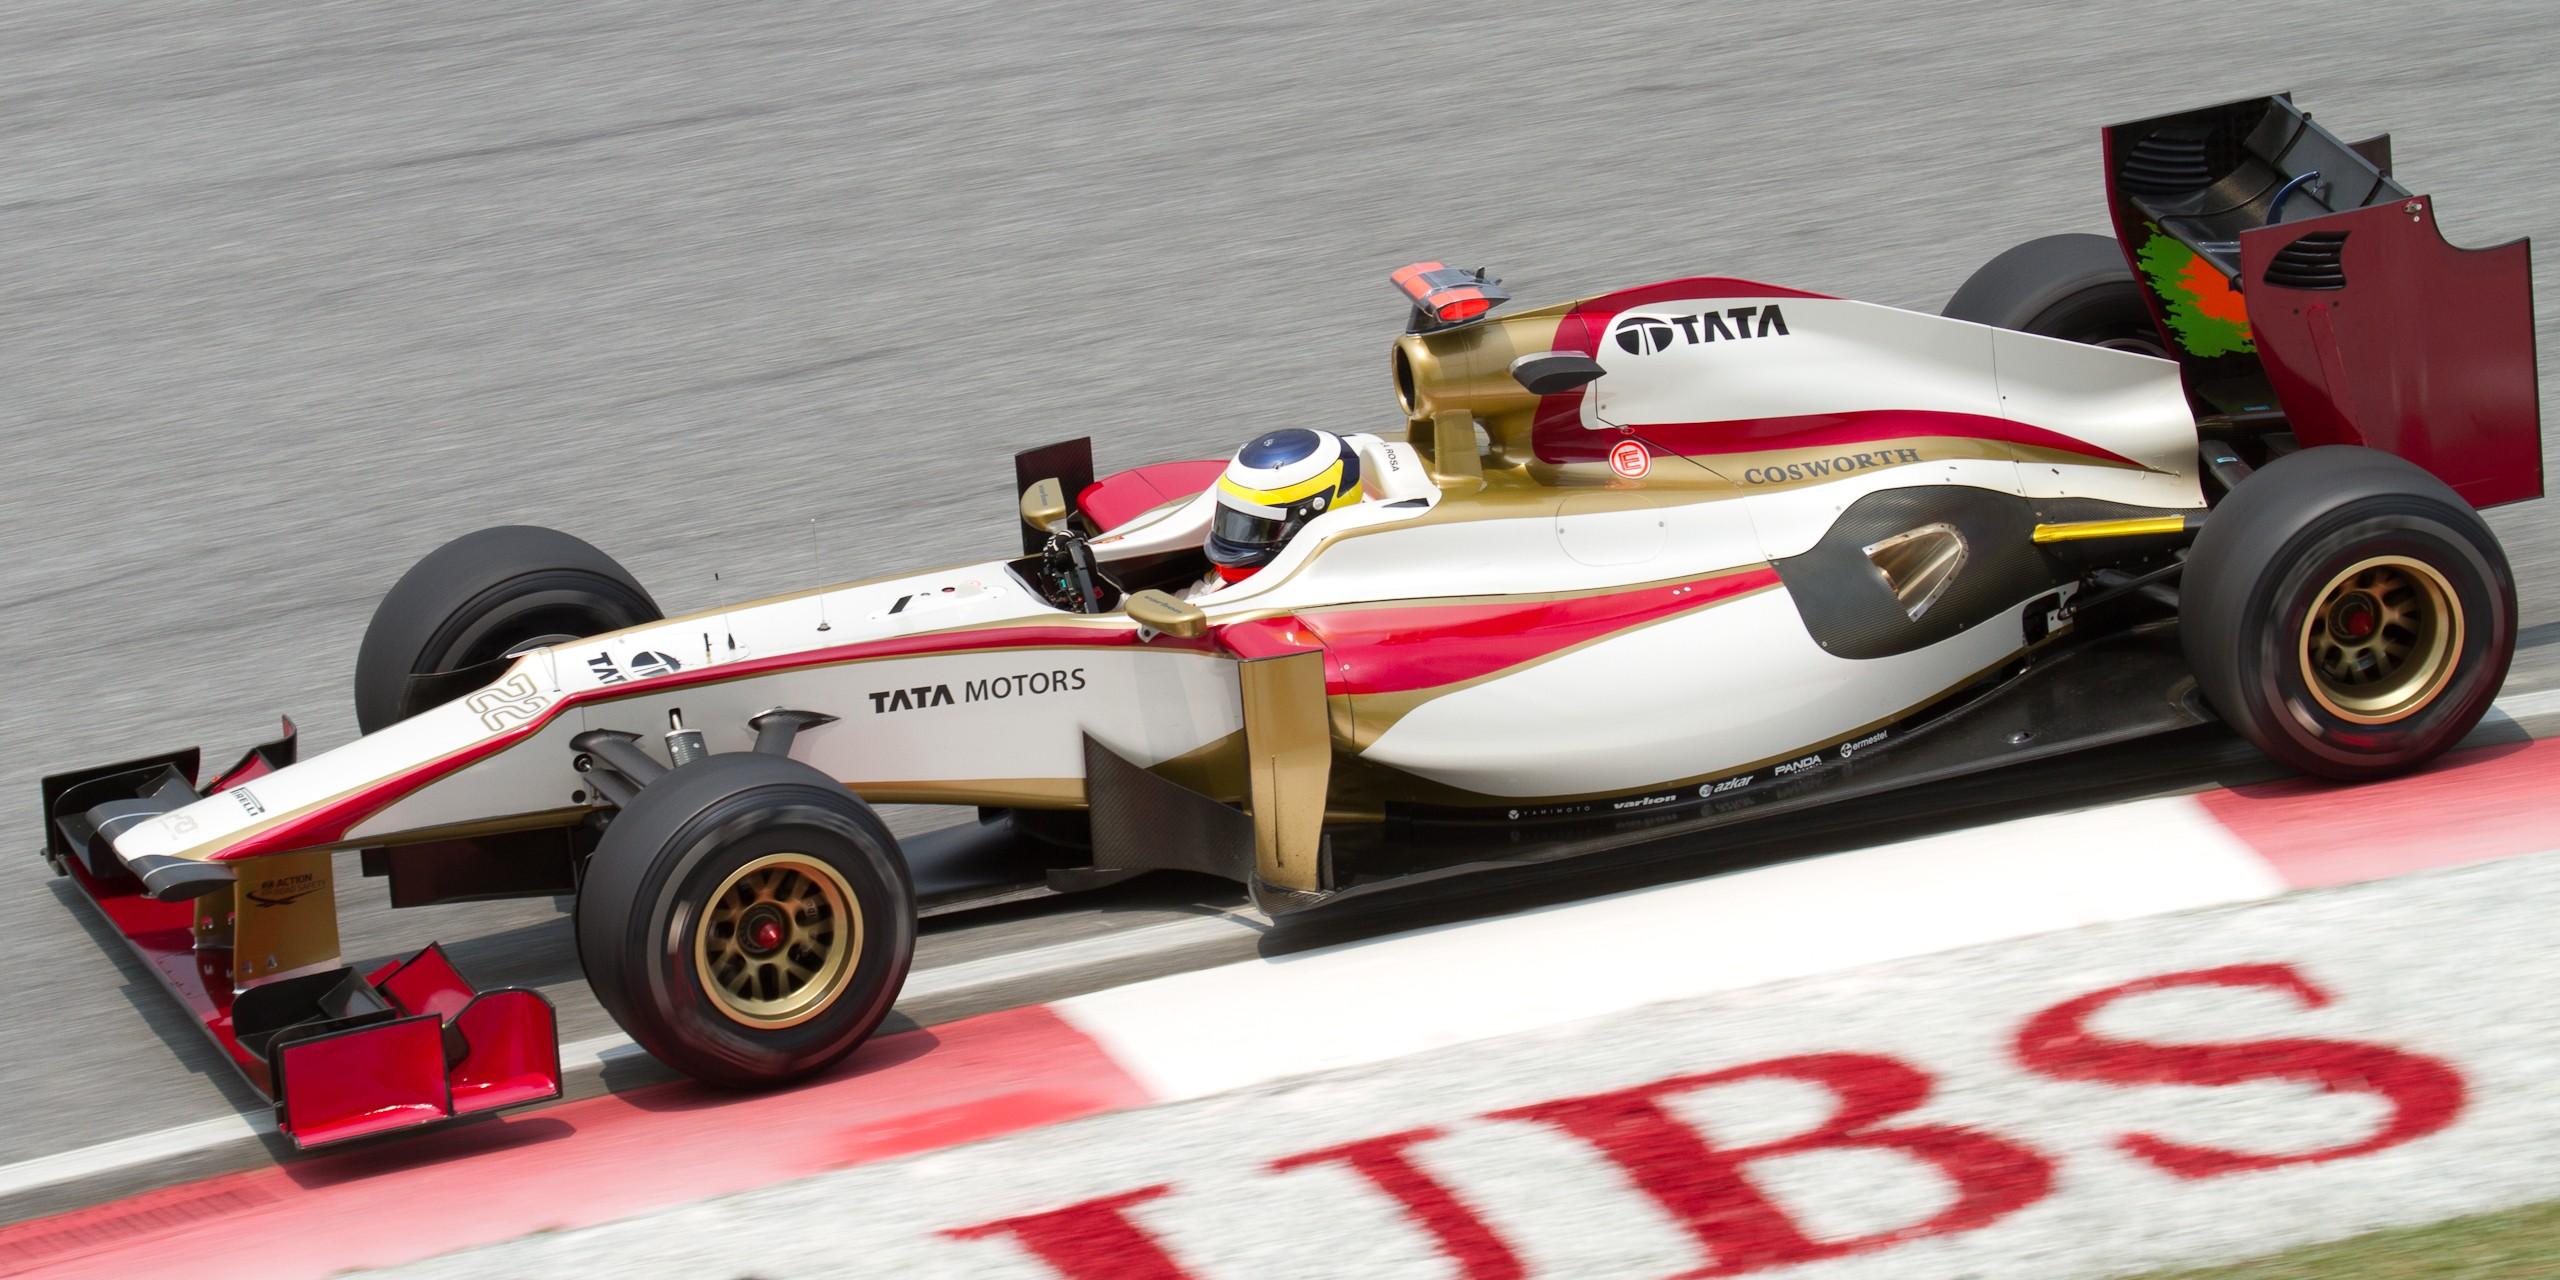 F1 hispania f1 2012 - foto by podcastf1brasil.com.br